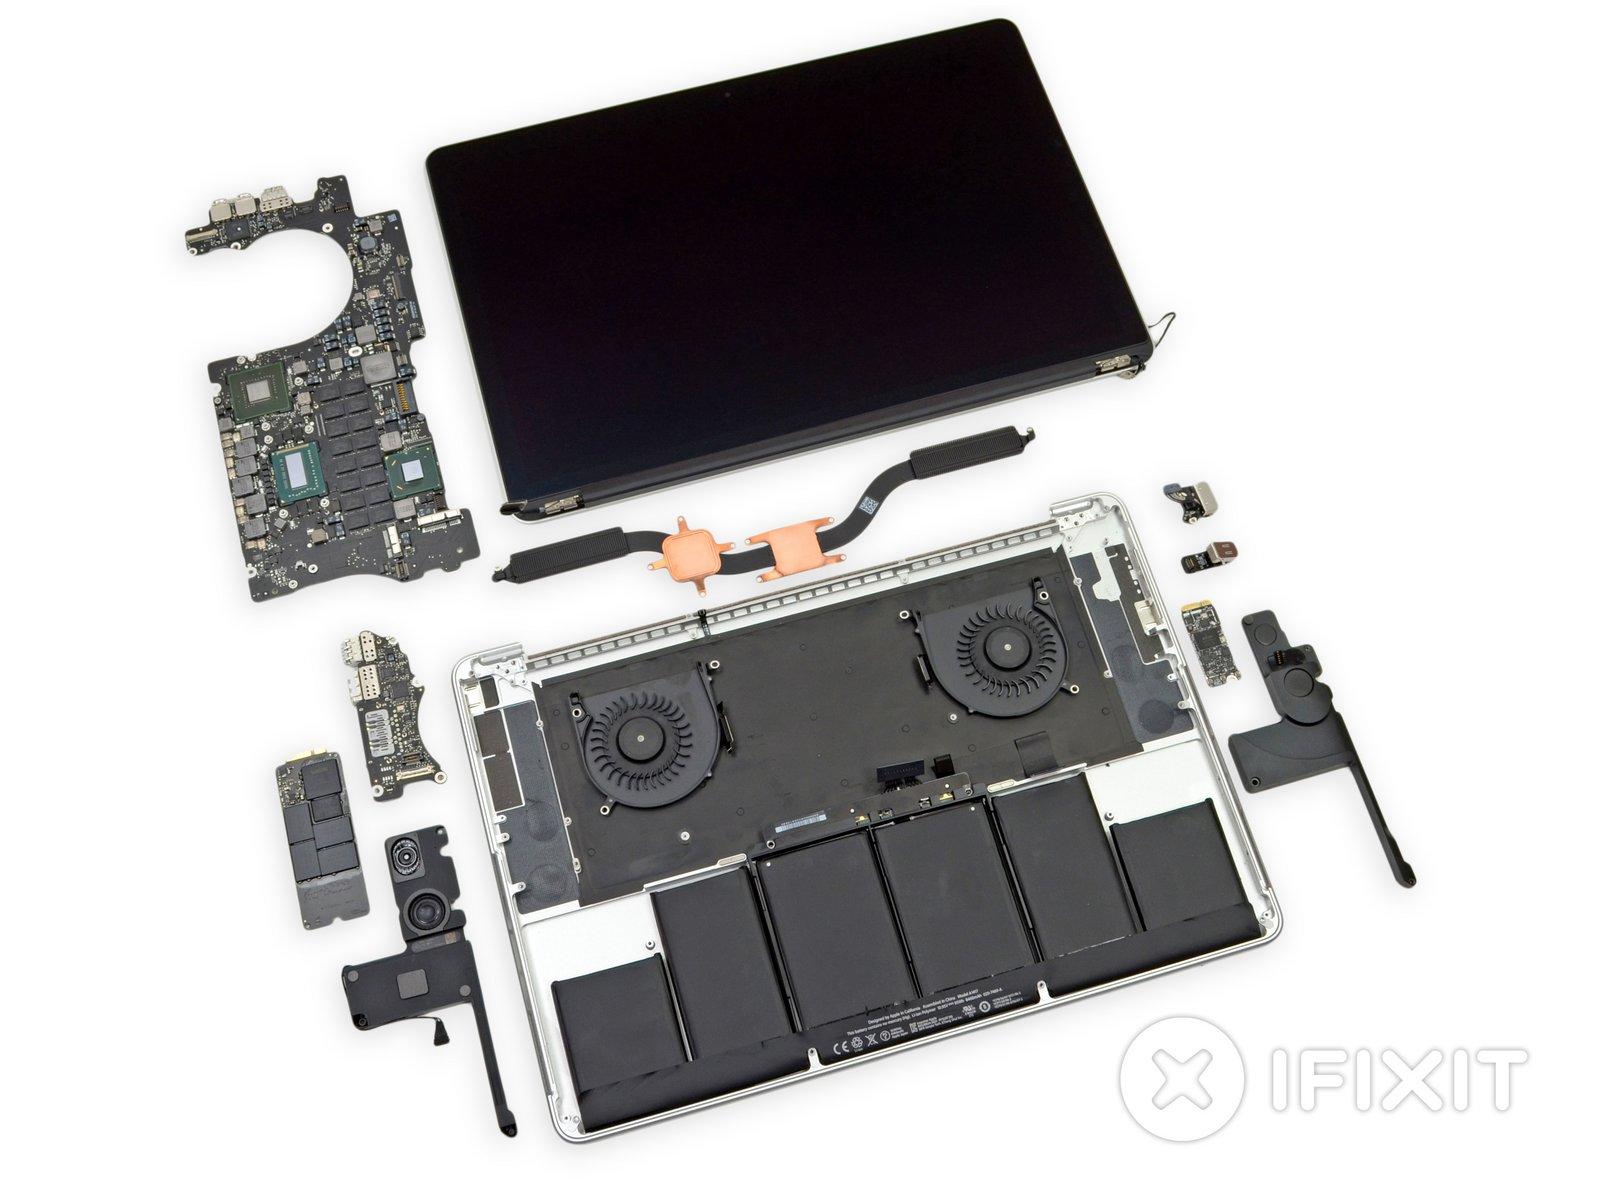 Macbook Pro 15 Retina Display Mid 2012 Teardown Ifixit No Disassemble Johnny 5is Alive